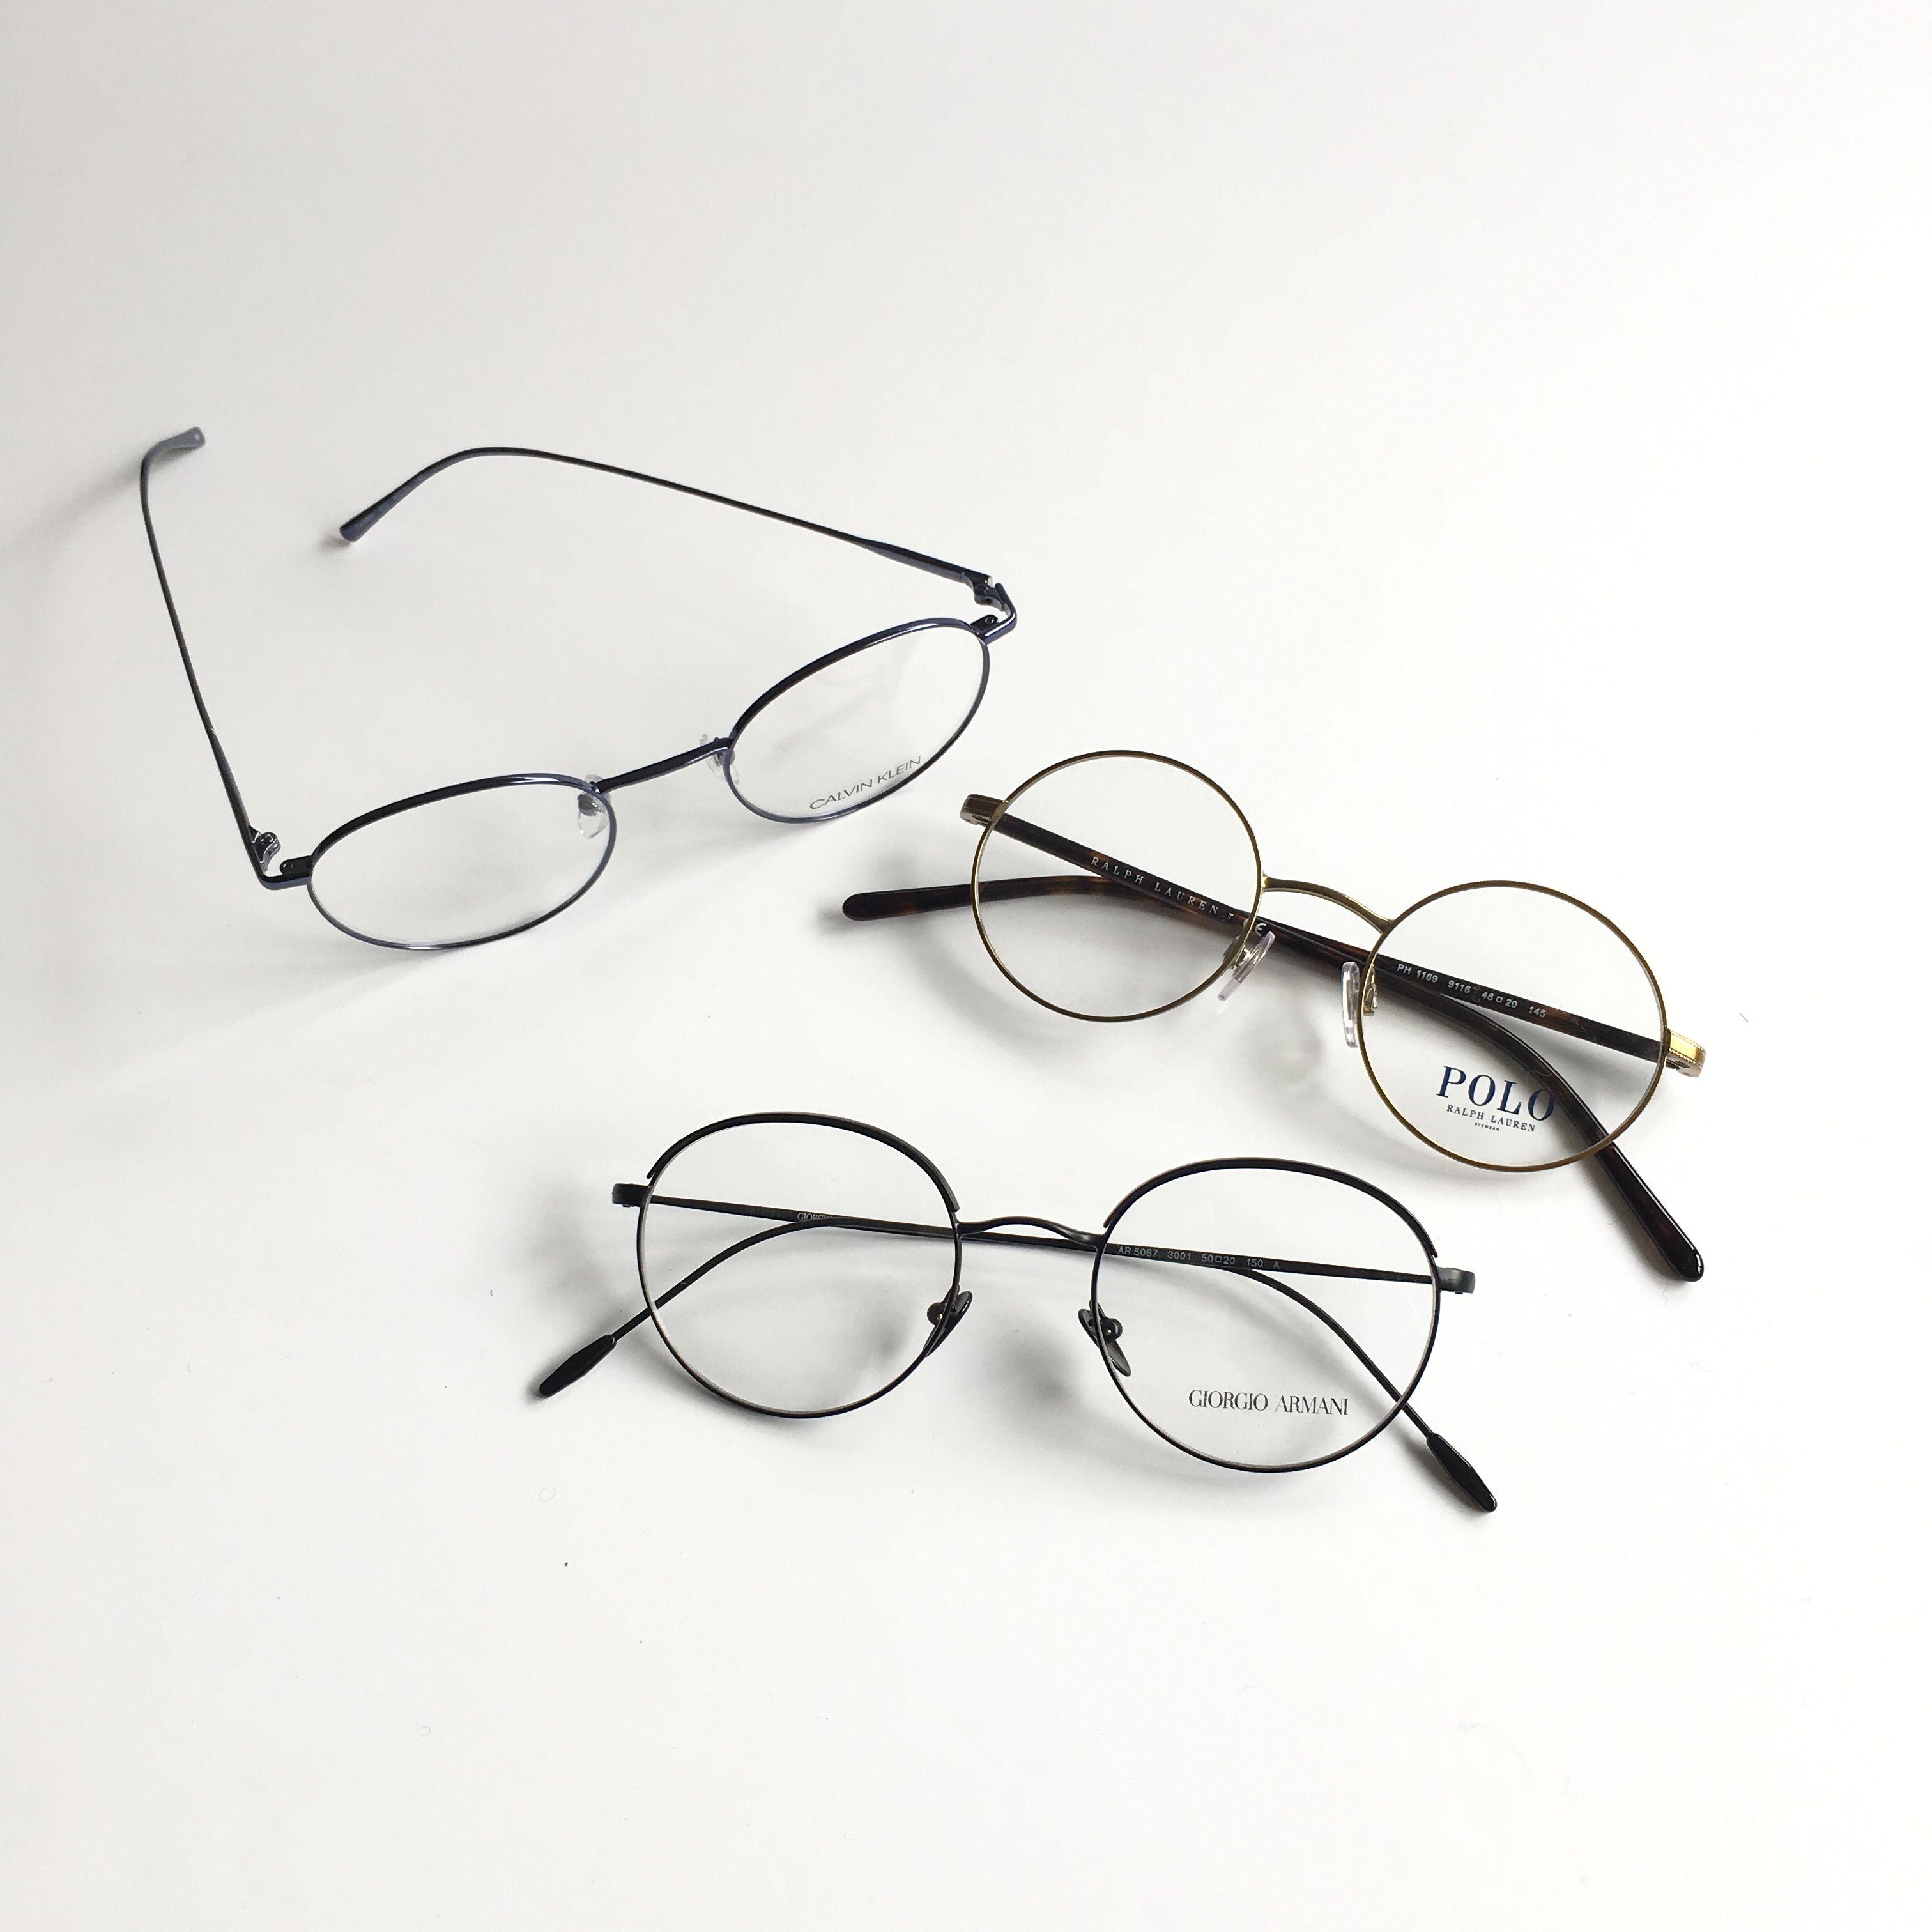 fdb38698a0 Giorgio Armani - Fashionable Italian Design eyewear for men and ...